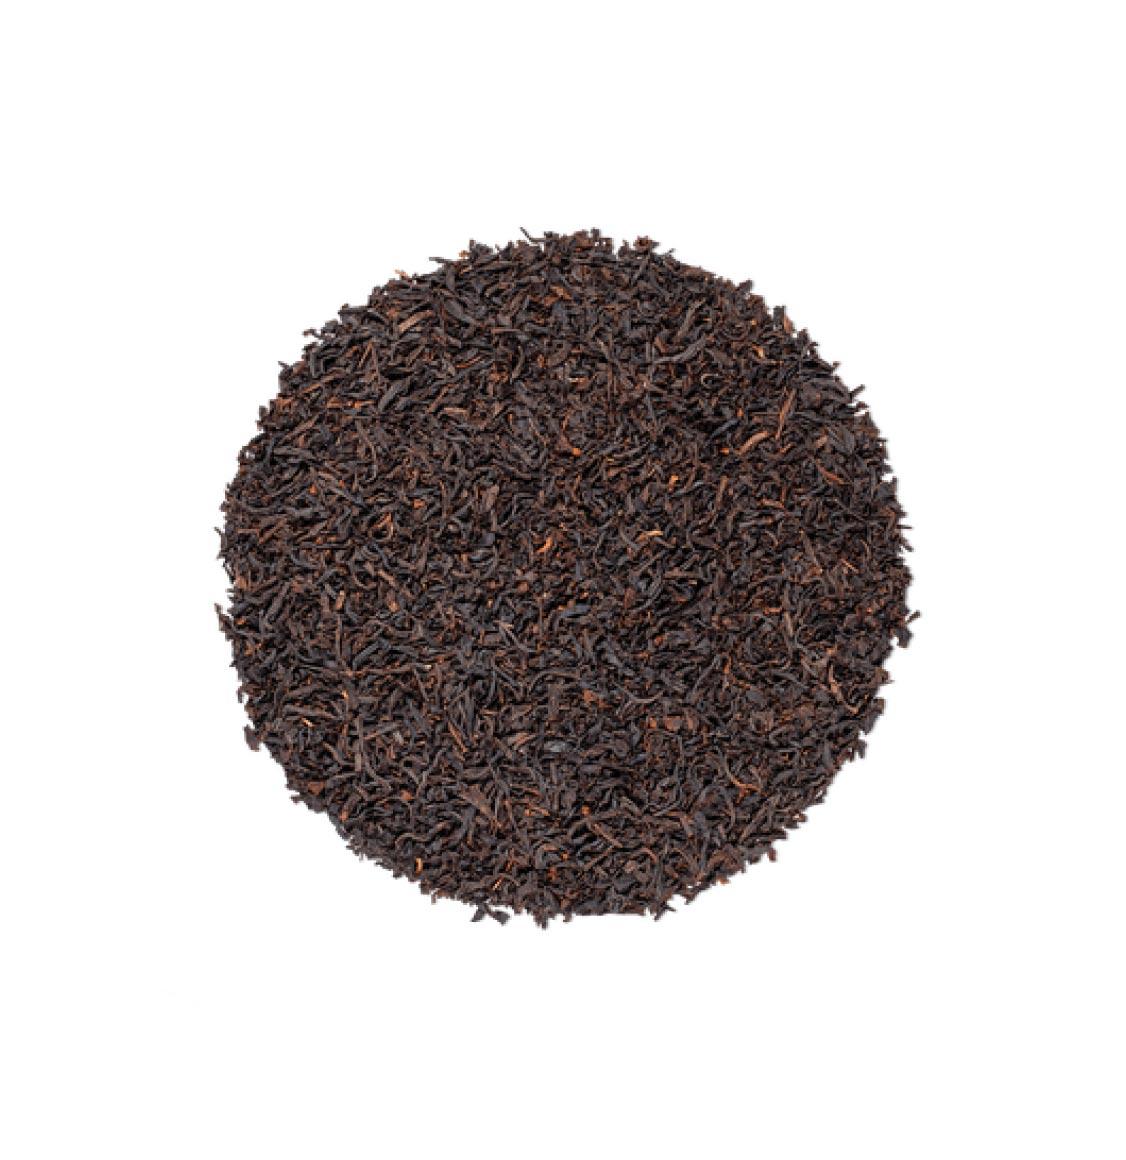 Kusmi Tea Four Red Fruits Organic Black Tea 100g